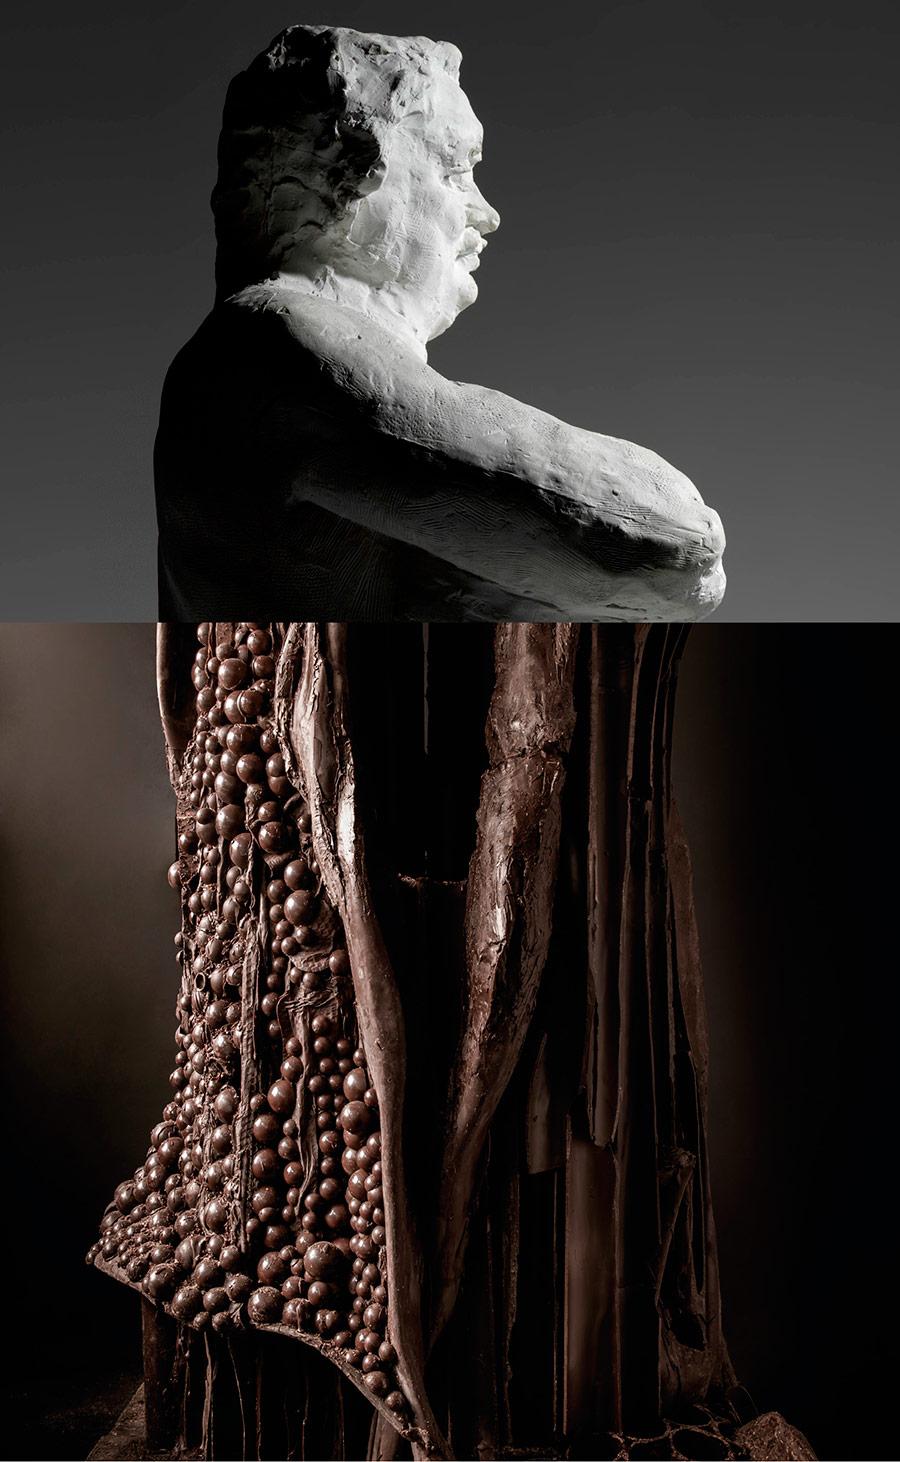 Sculpture balzac en chocolat patrick roger - Sculpture en chocolat patrick roger ...